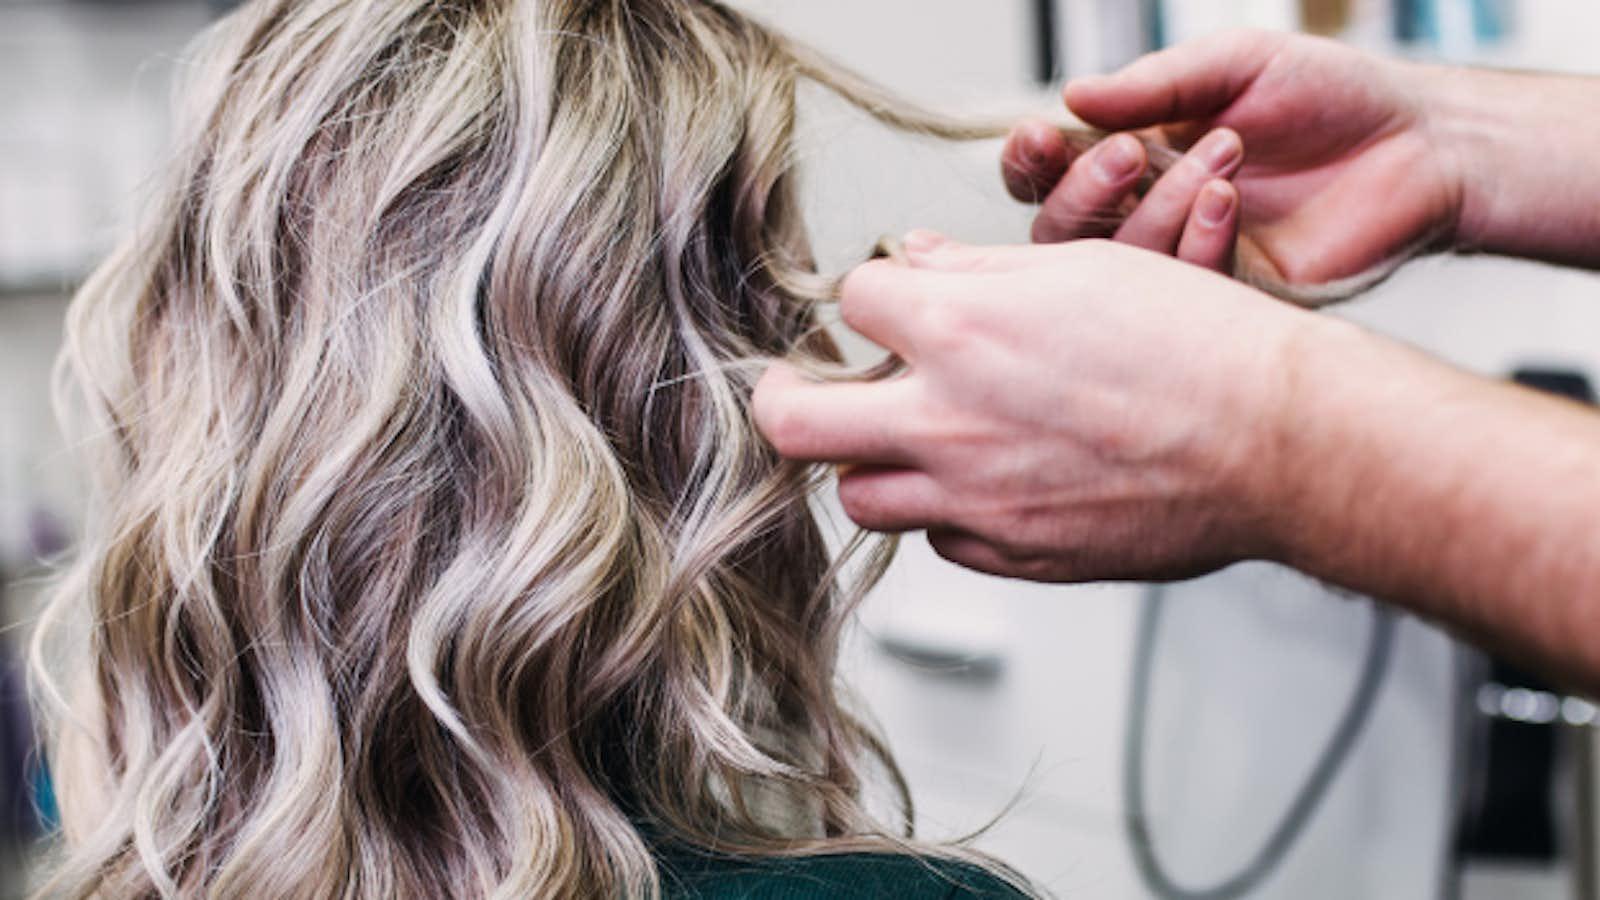 Blush & Blow Hair & Beauty